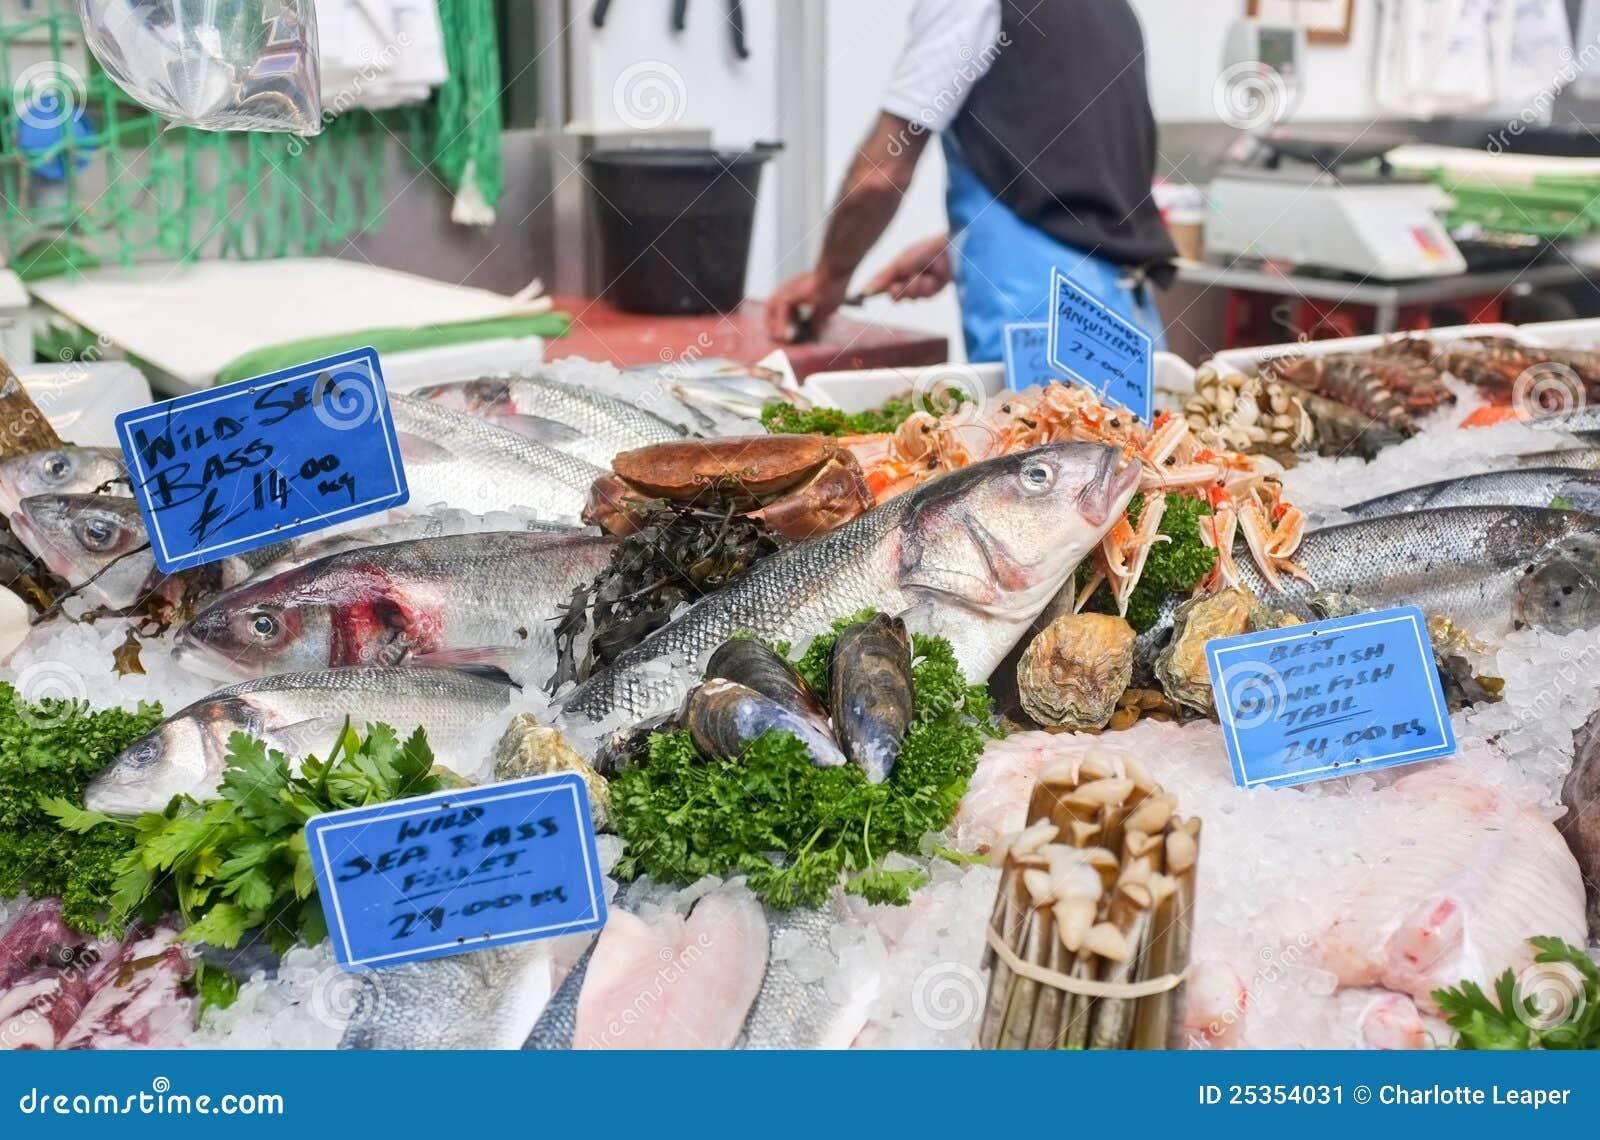 Fresh fish market stall stock image image 25354031 for Fresh fish market miami